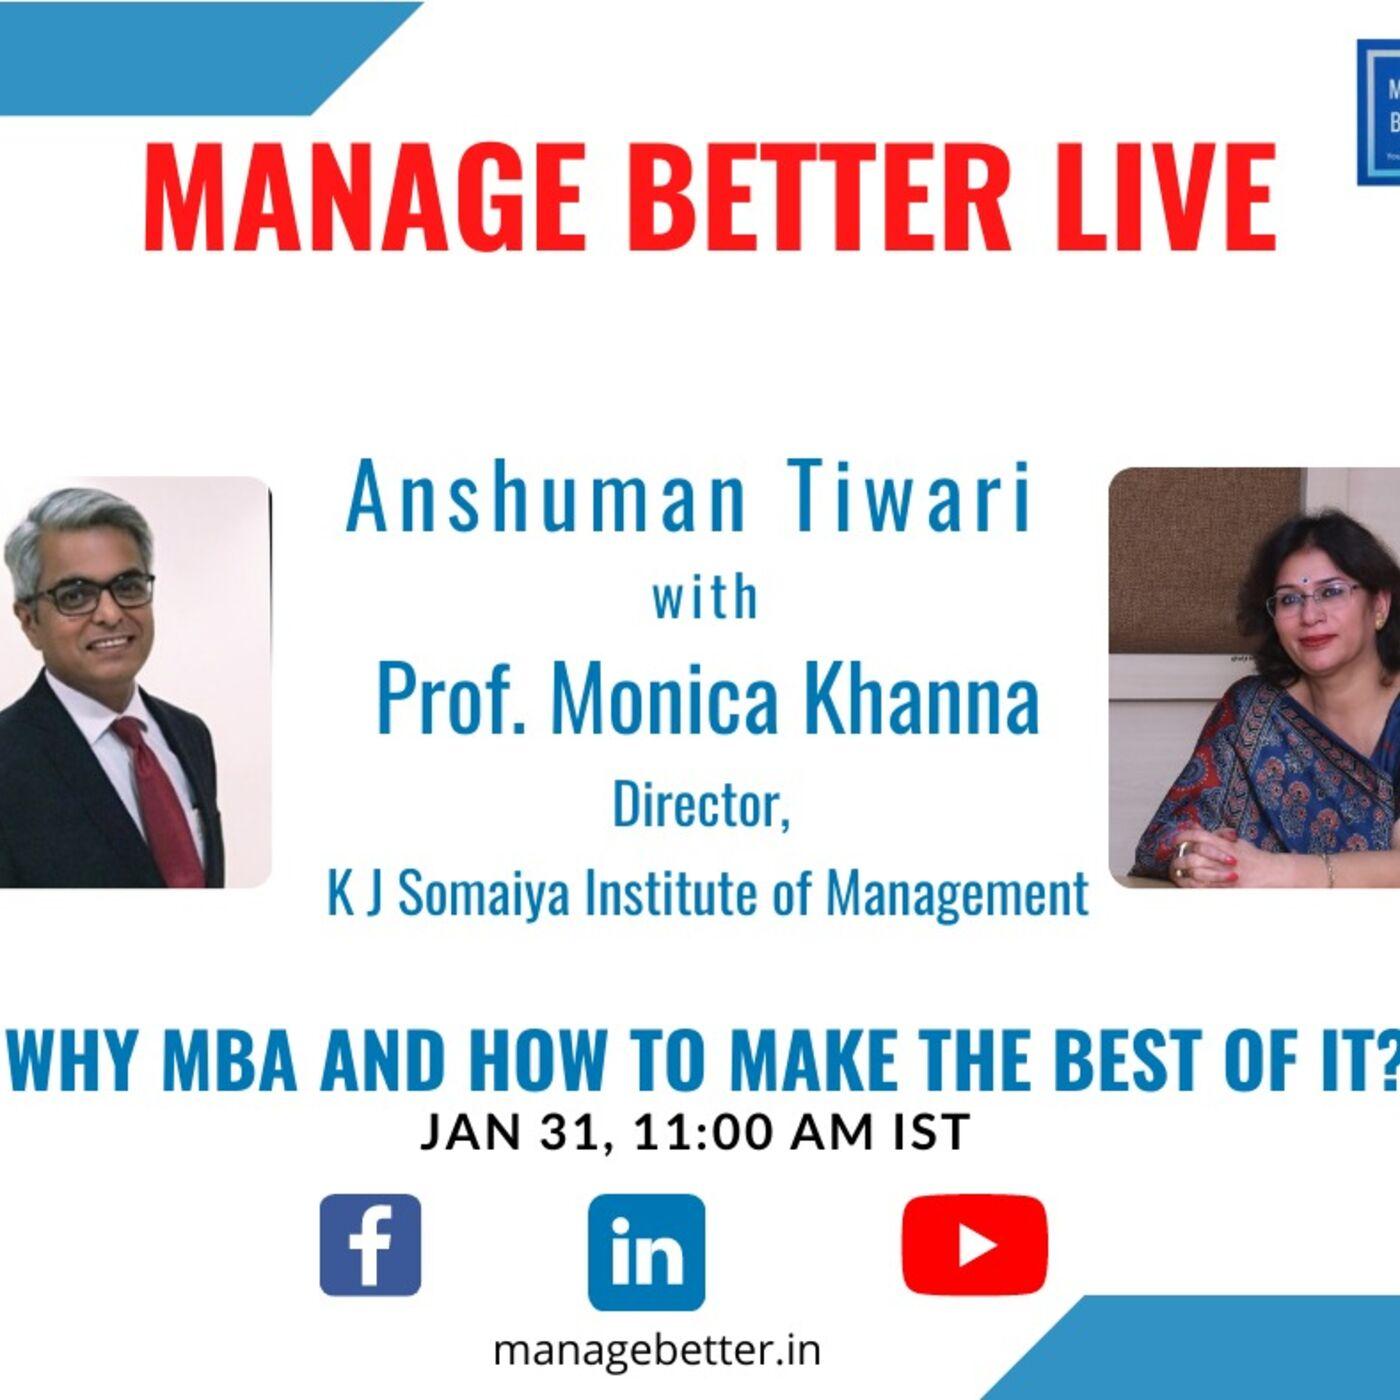 Why do an MBA and how to make the most of it? A conversation with Prof. Monica Khanna